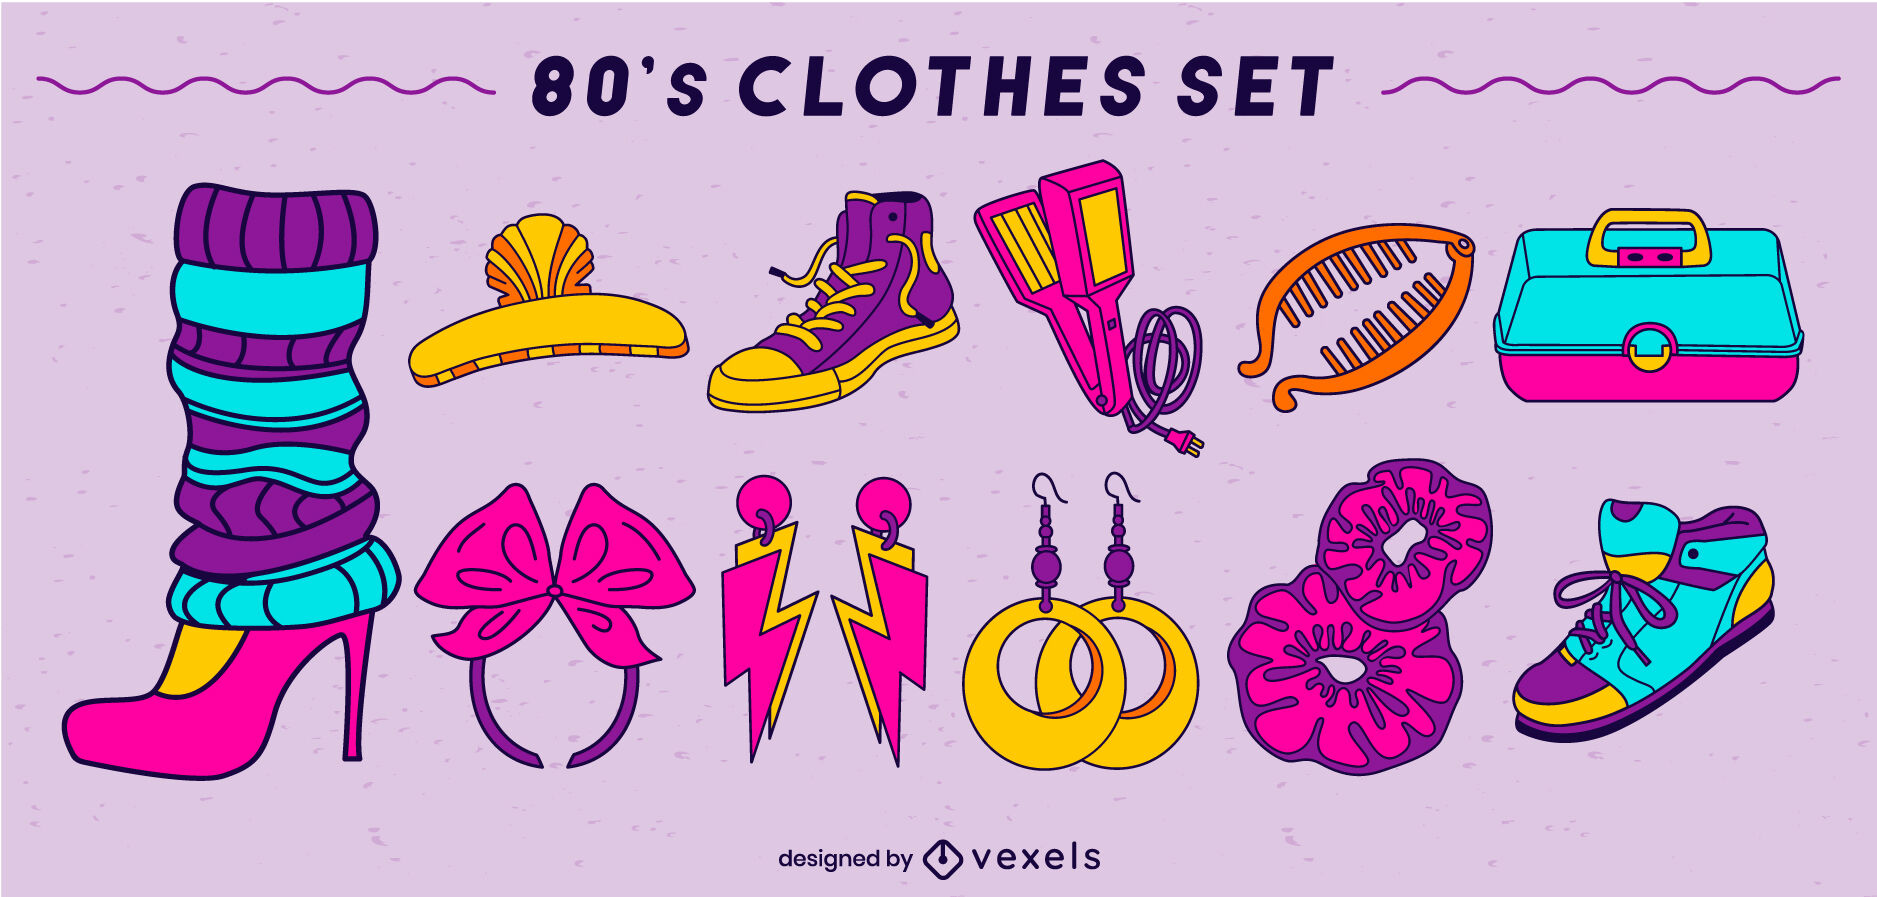 80s clothing color stroke set